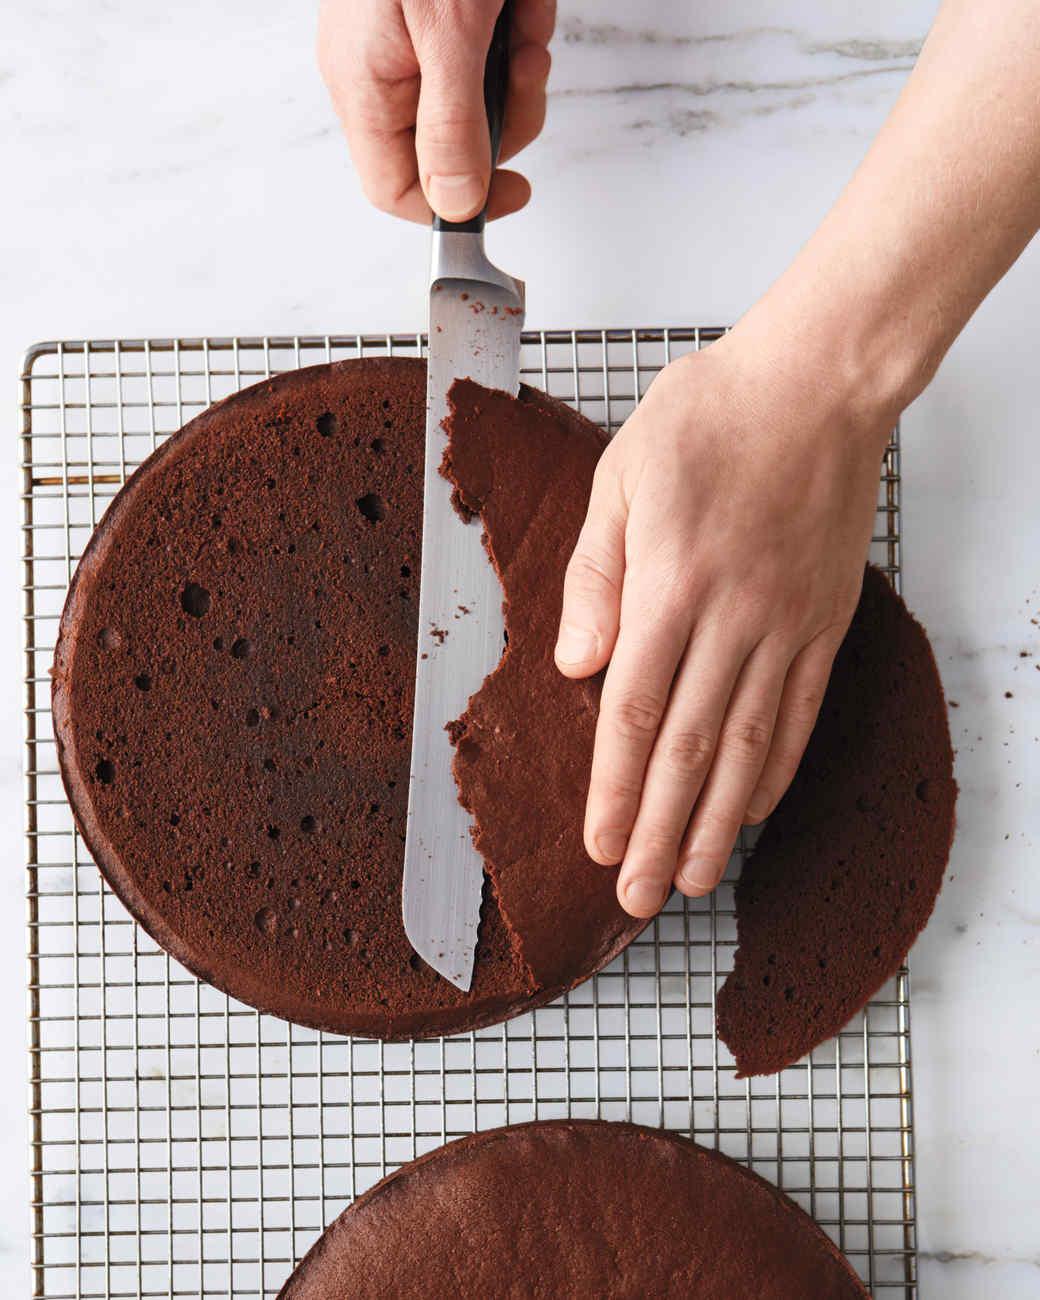 devils-food-cake-process-255-d112204.jpg